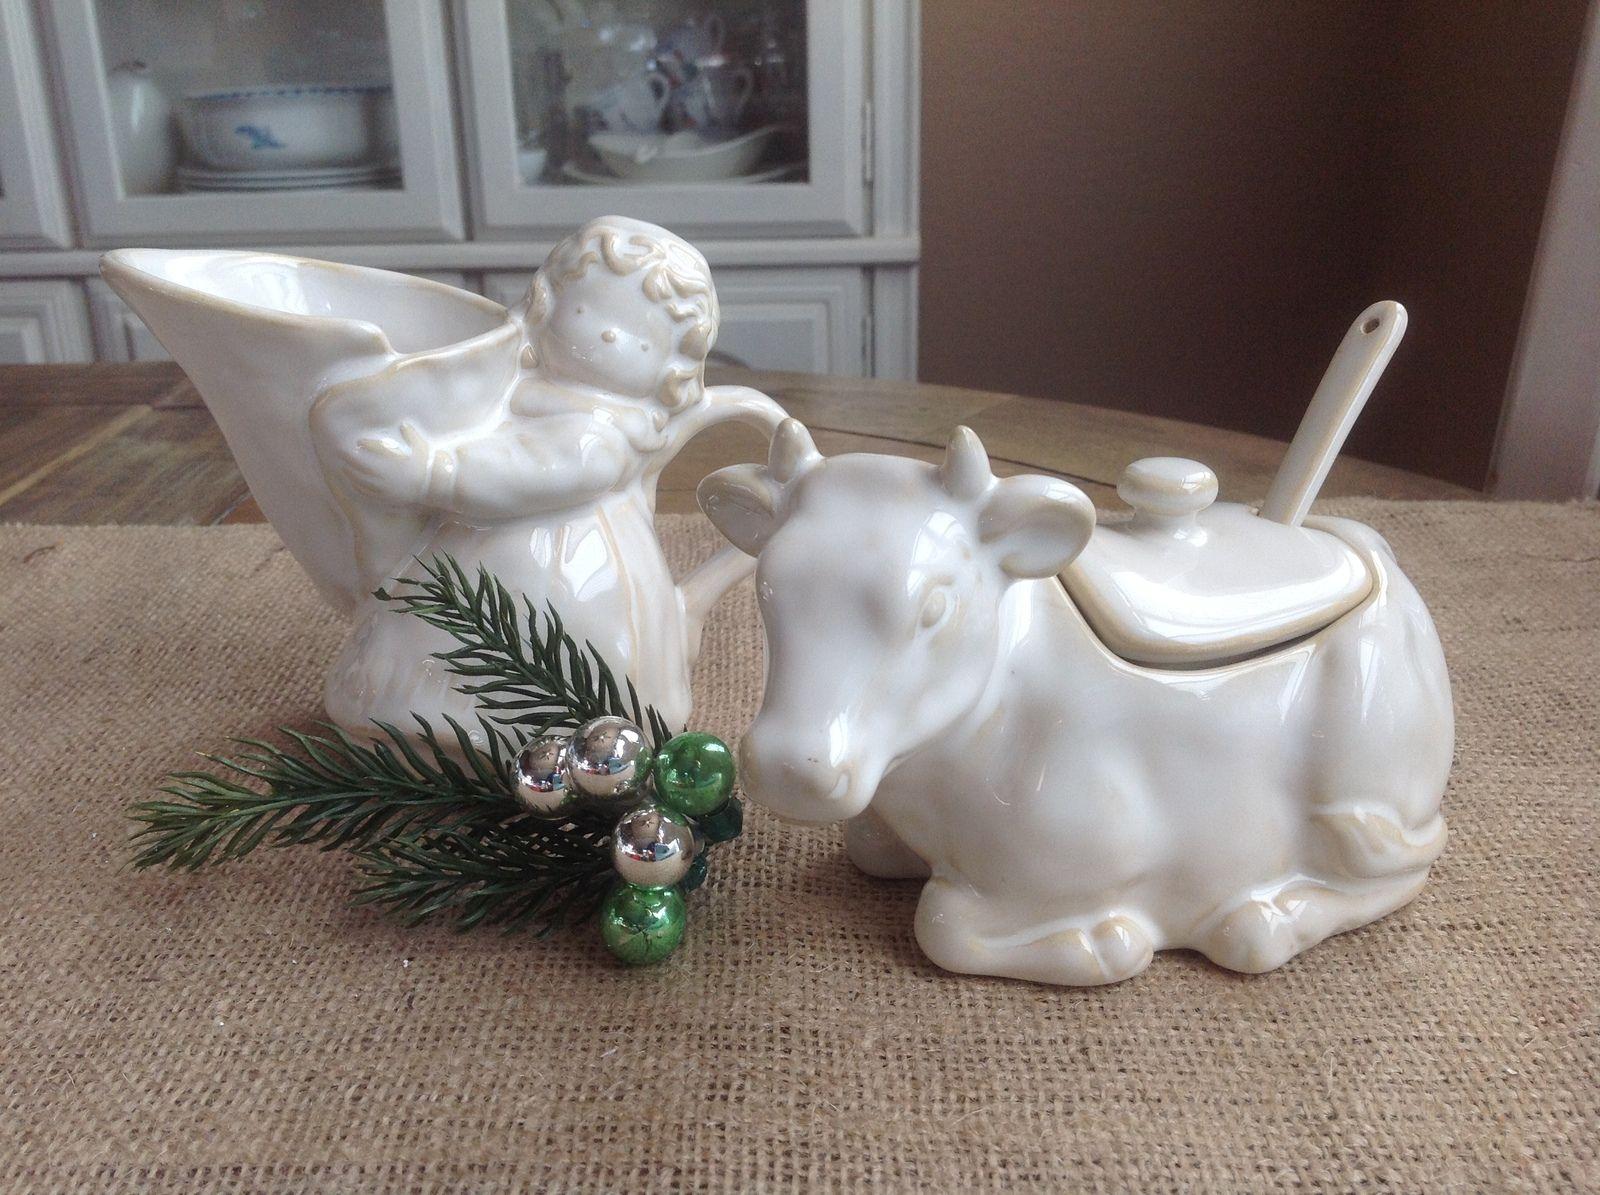 #potterybarn #12daysofchristmas Wonderful 12 days of ...